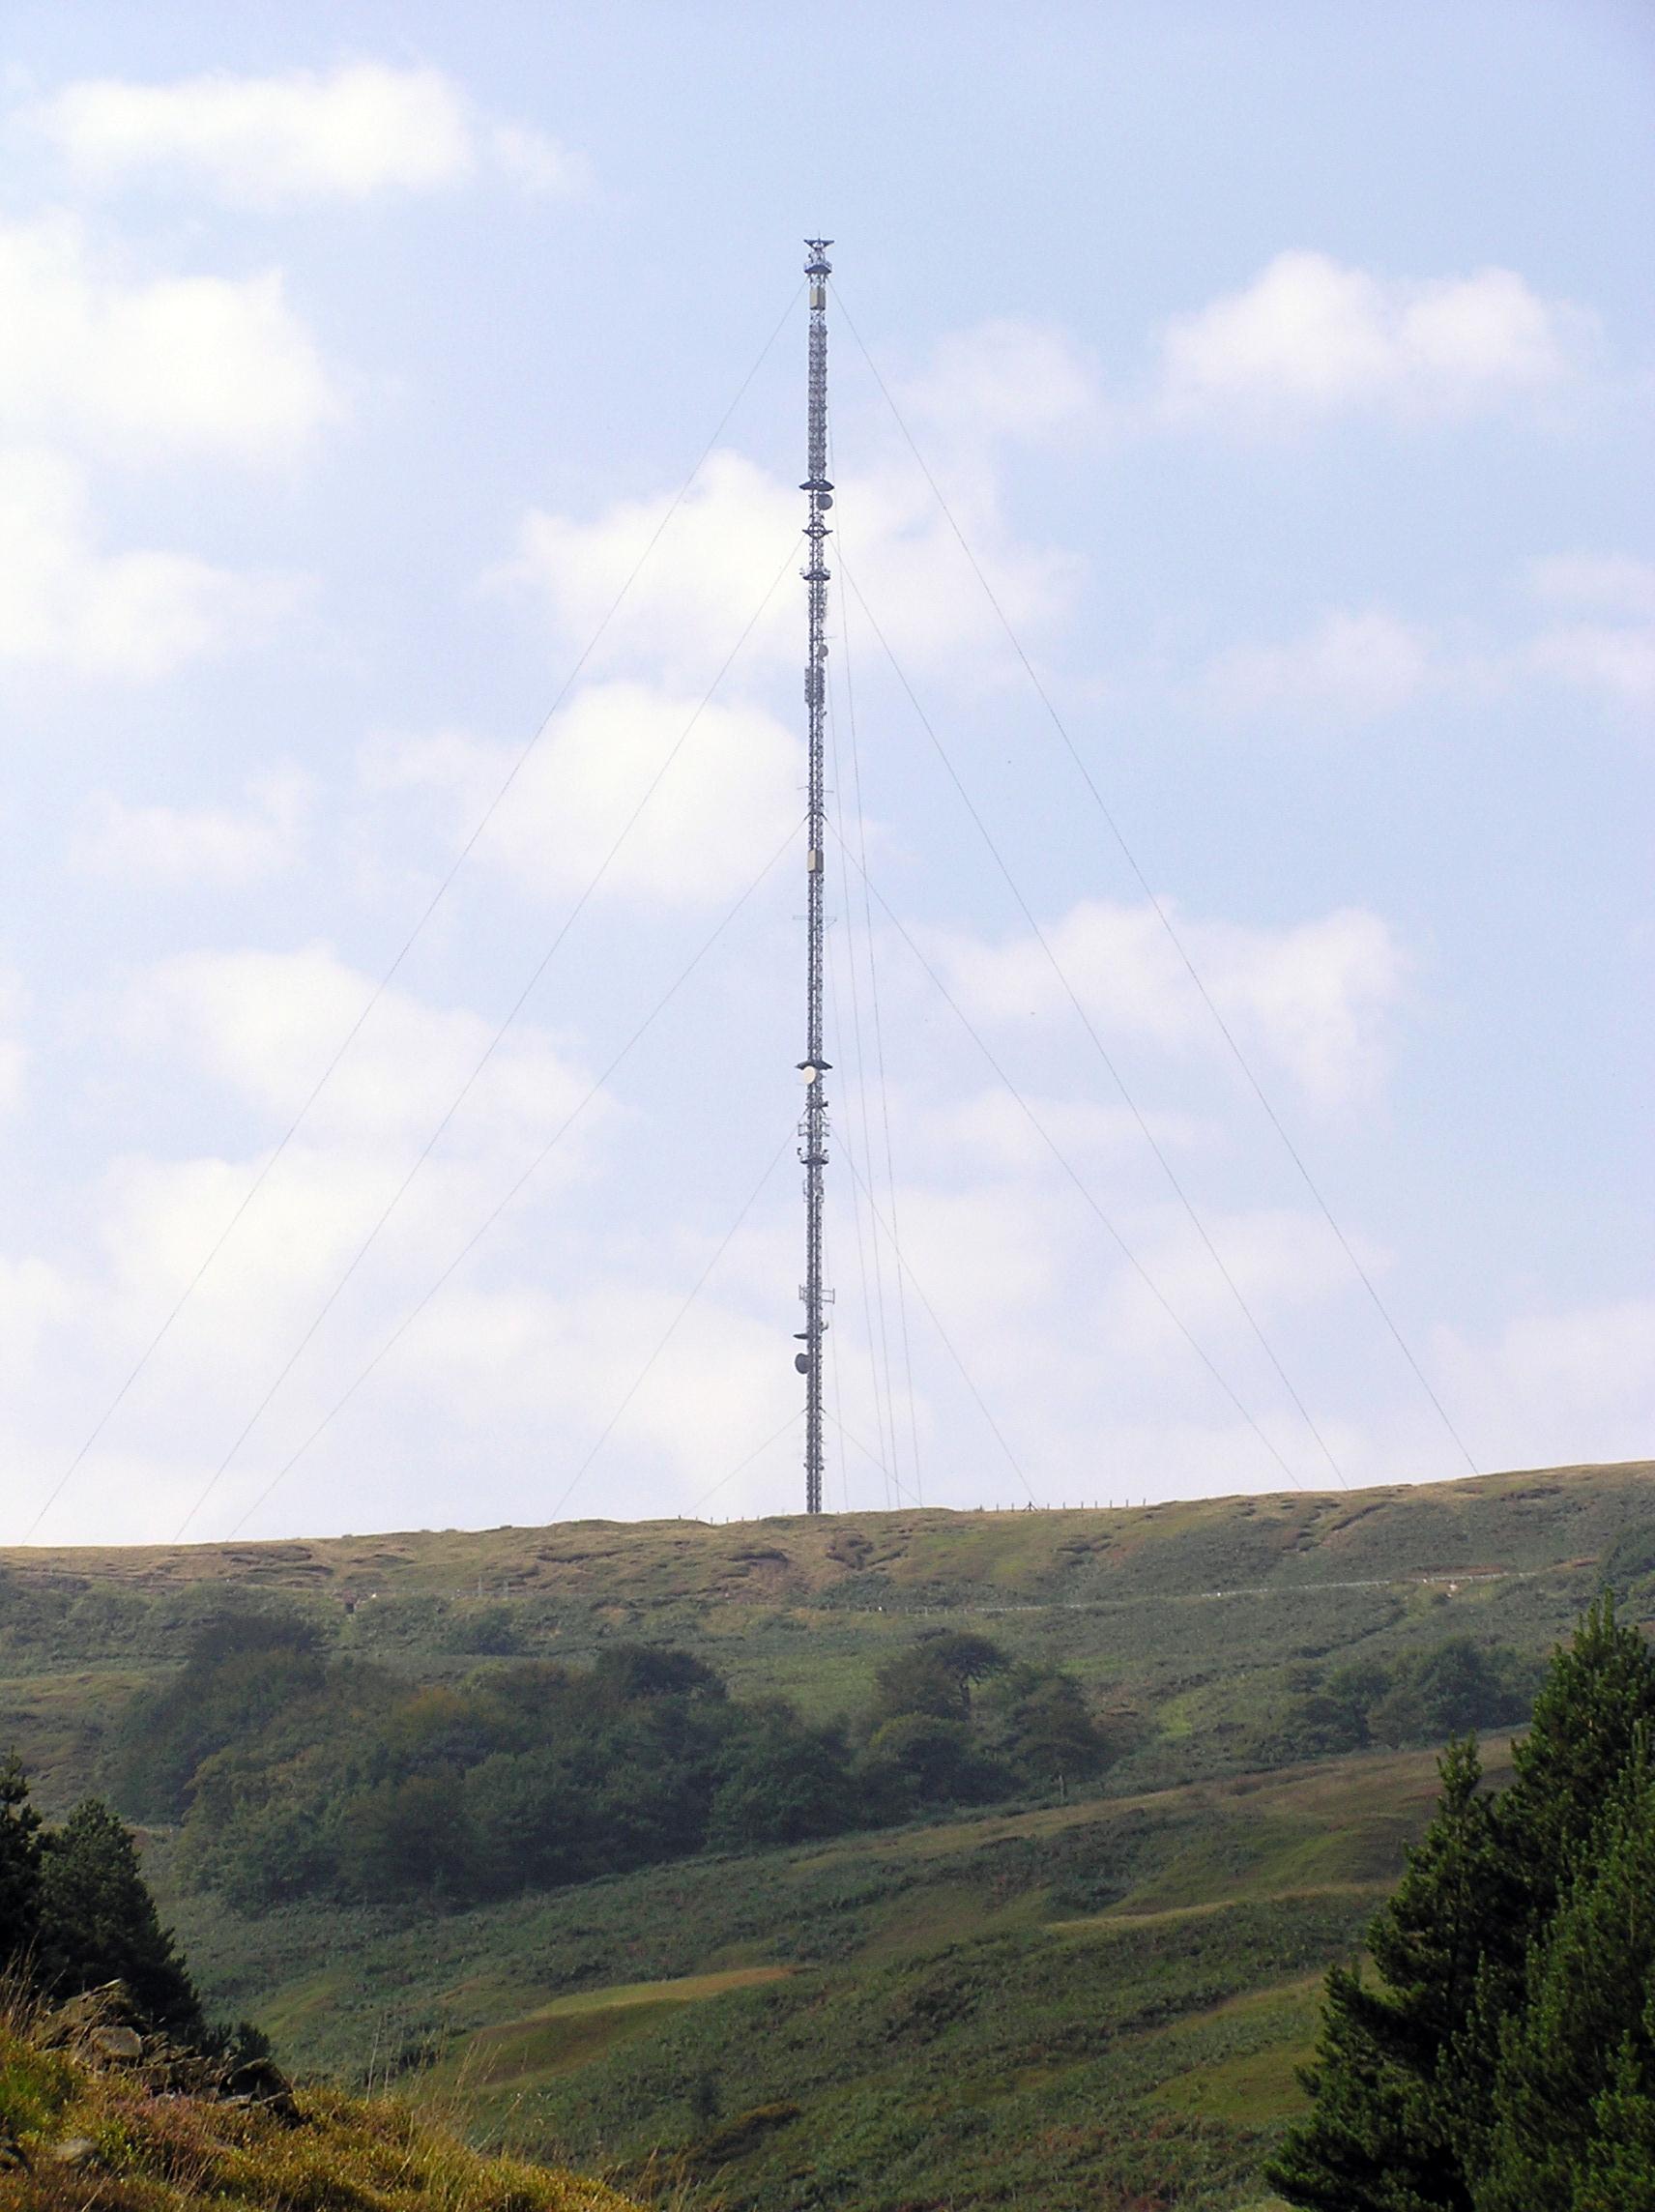 Holme Moss Transmitting Station Wikipedia Schematics Fm Transmitters Tv Stereo